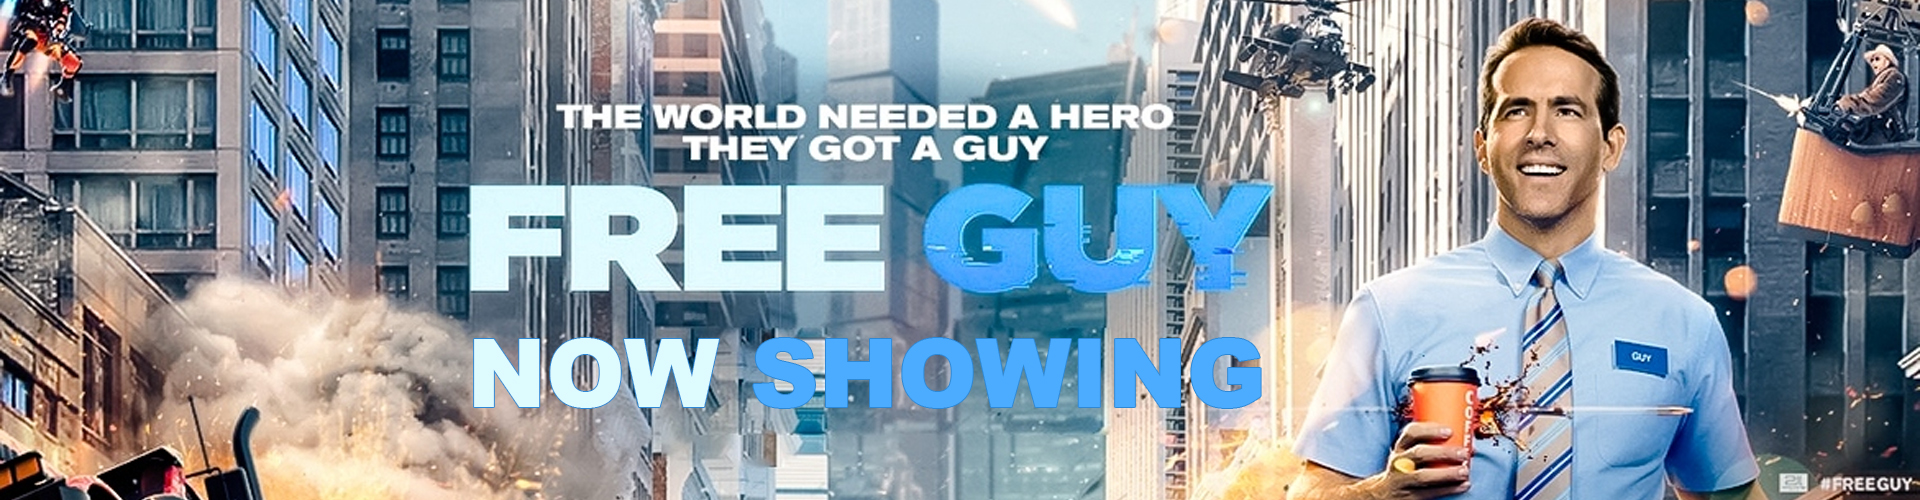 free_guy_NowShowing_WebsiteBanner